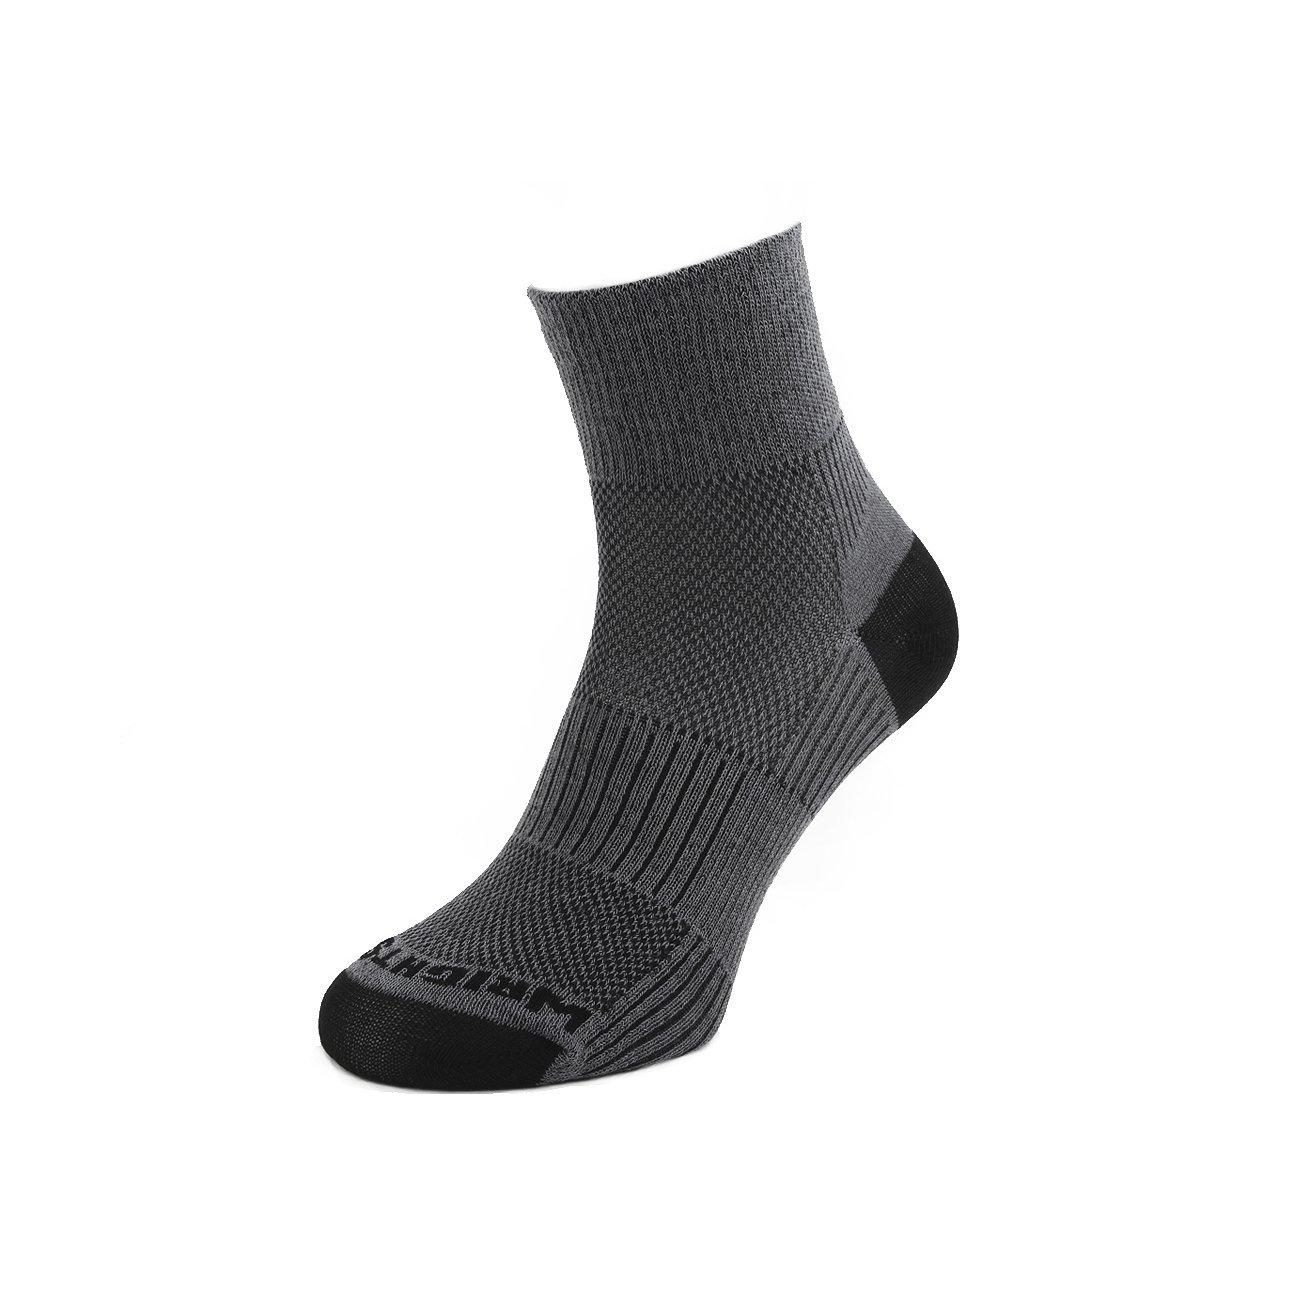 Wrightsock Coolmesh II Quarter Socke Noir